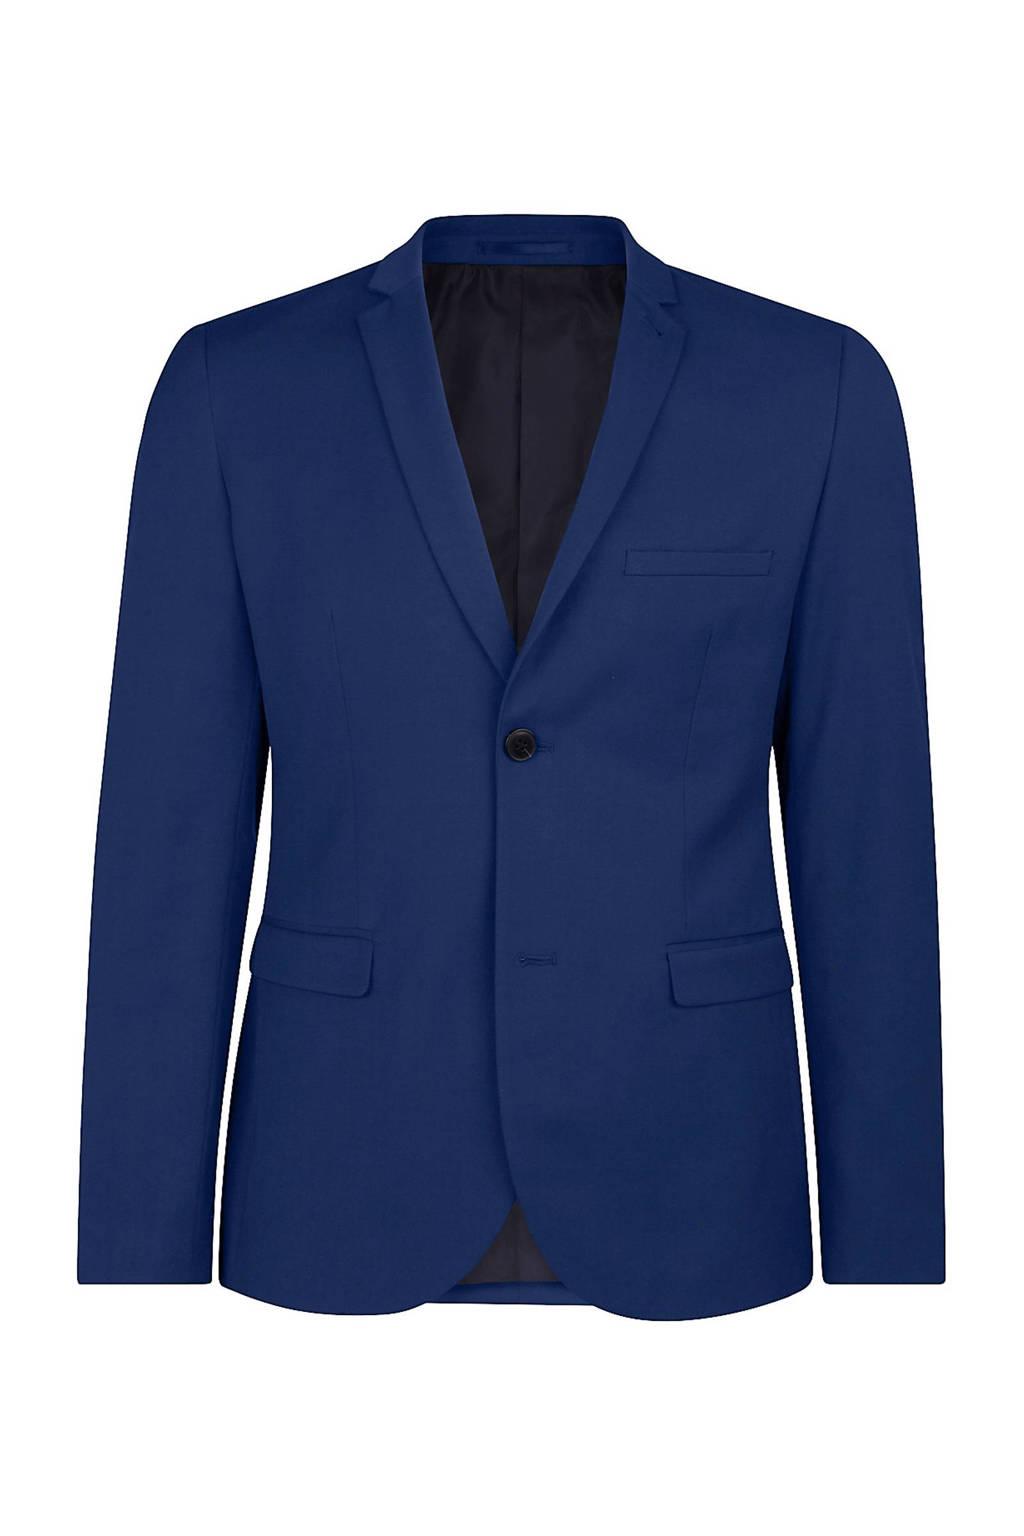 WE Fashion skinny fit colbert blauw, Blauw